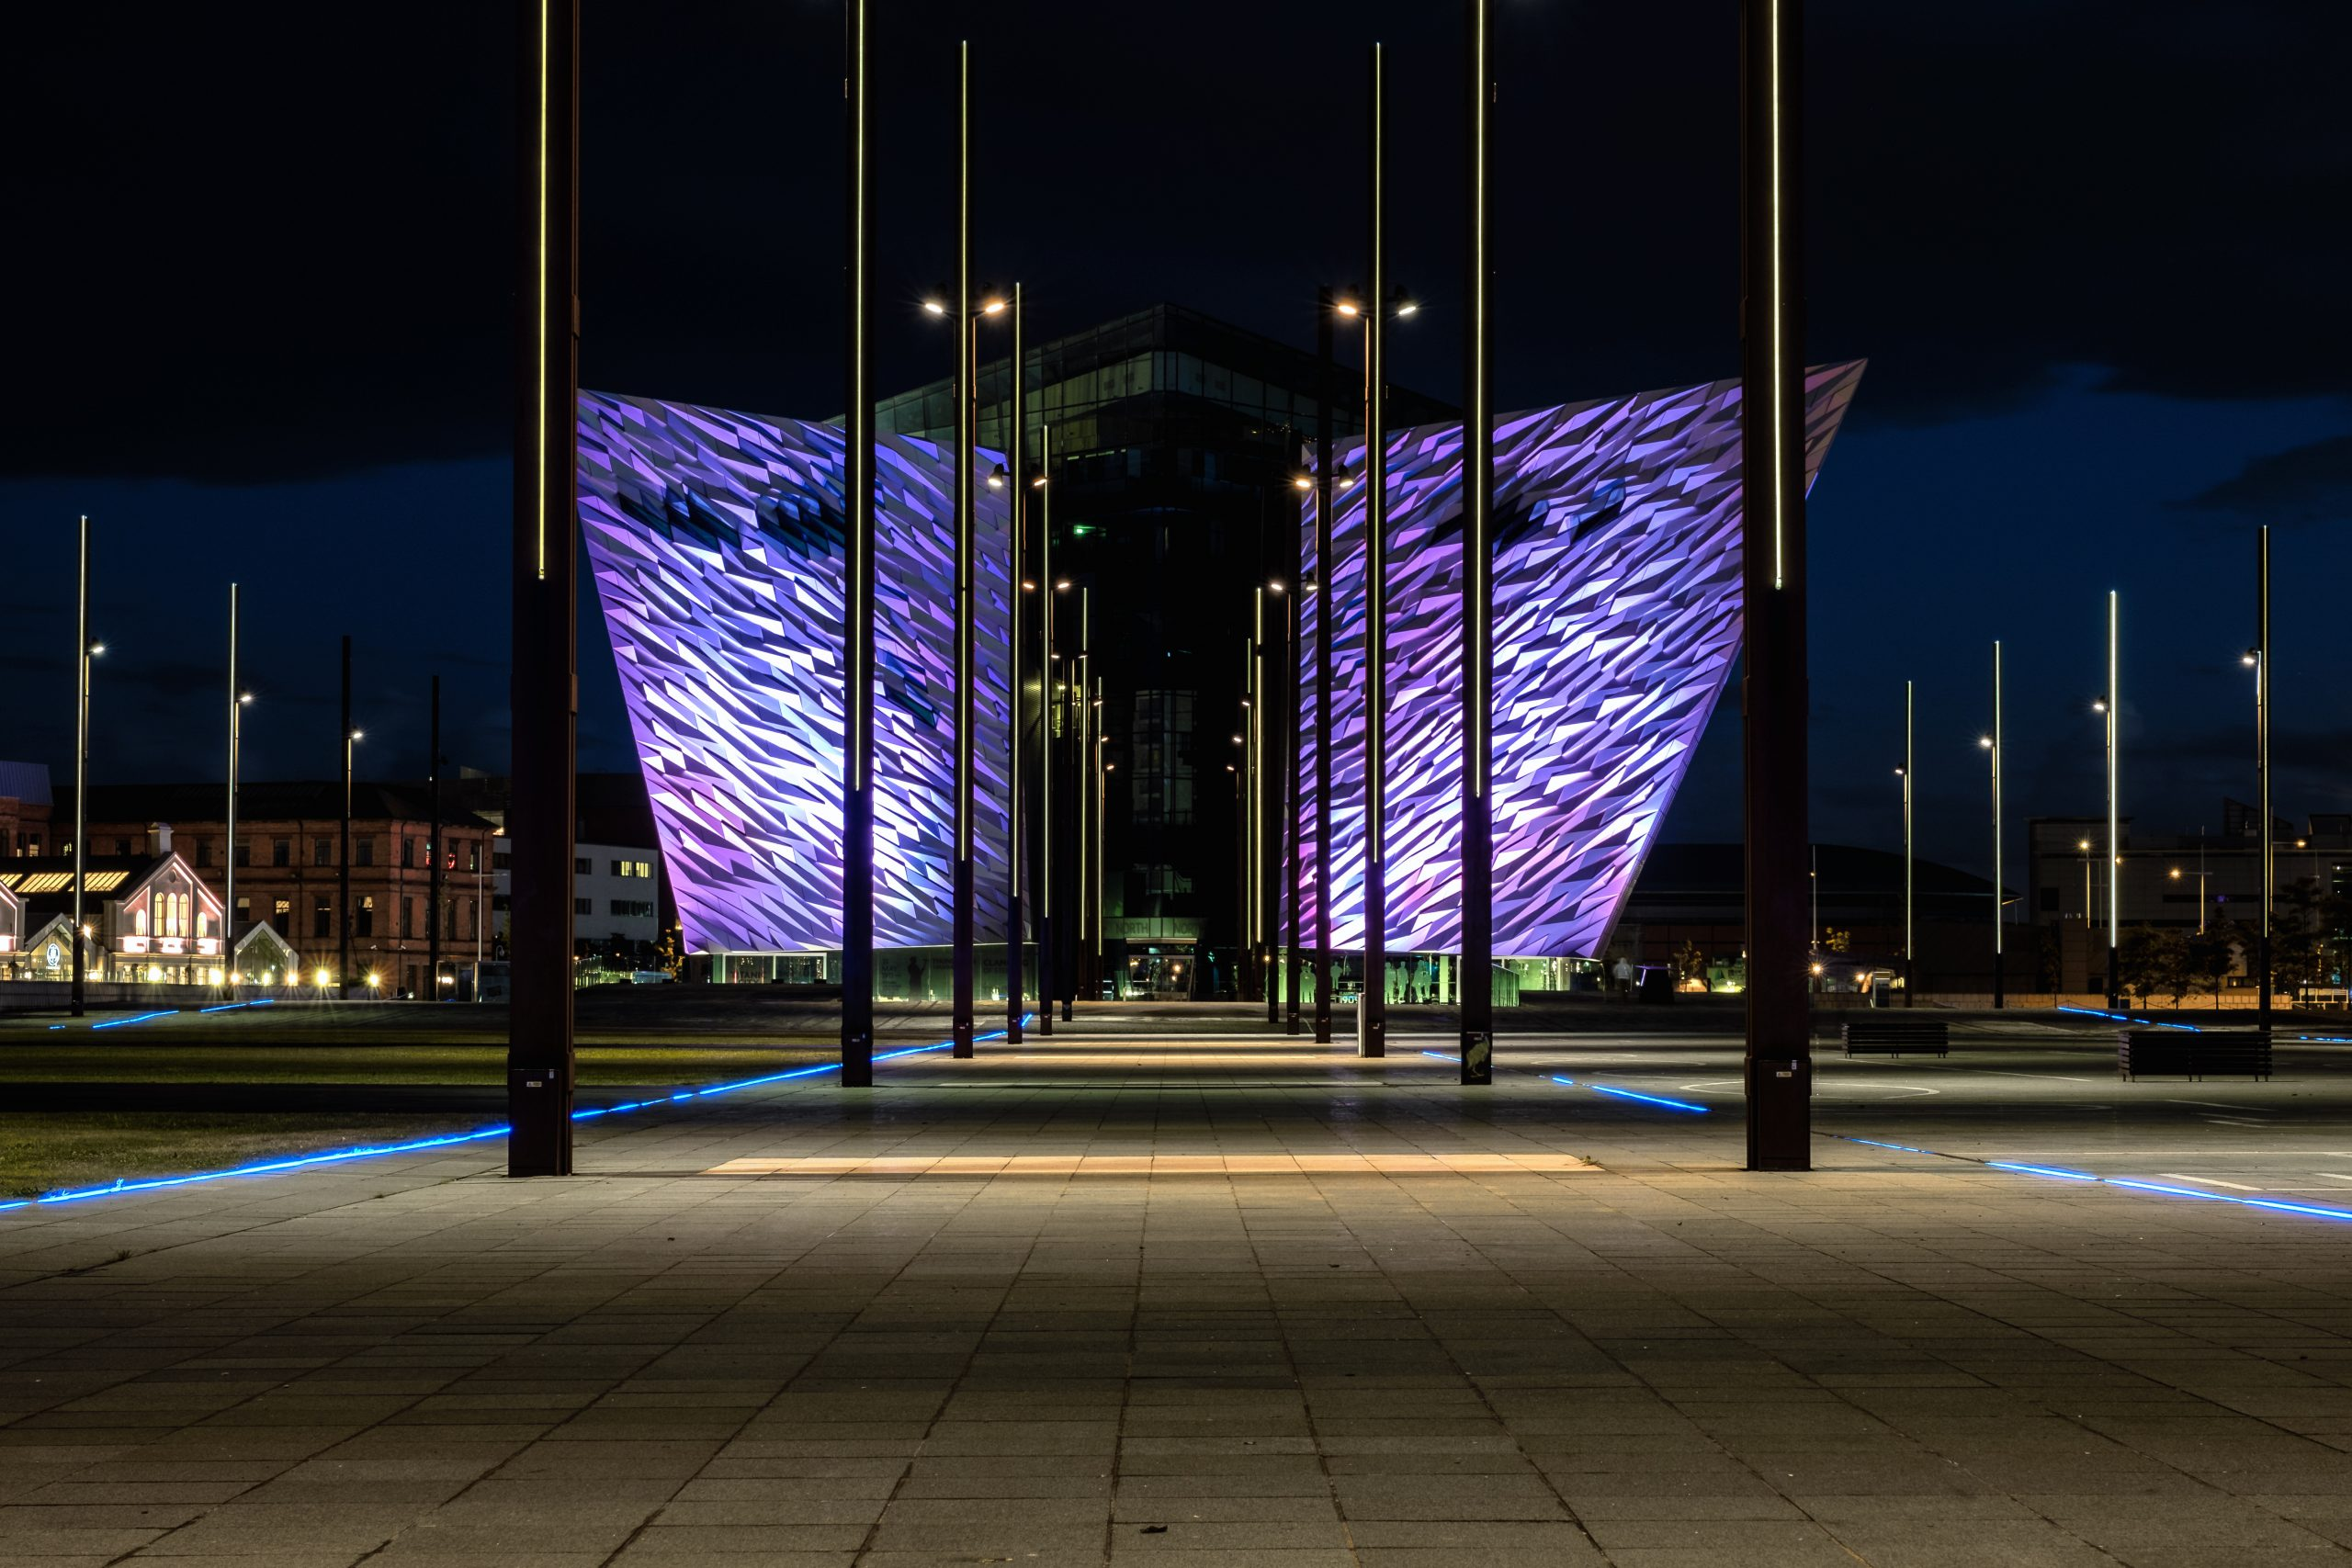 Titanic Belfast by night